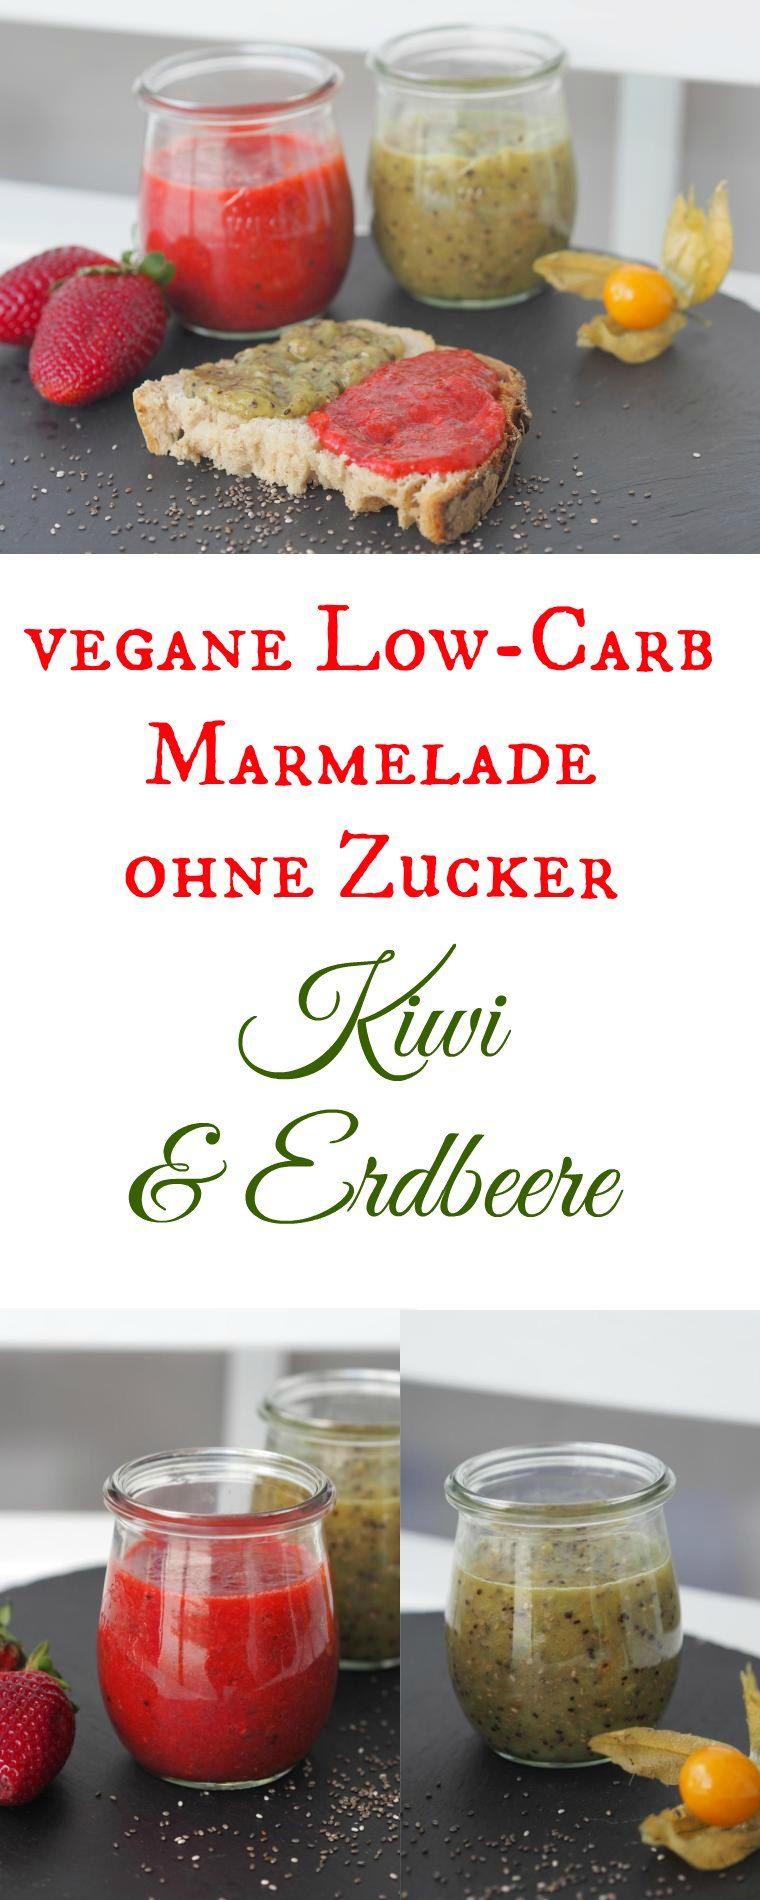 low carb marmelade ohne zucker kiwi erdbeere rezept low carb pinterest. Black Bedroom Furniture Sets. Home Design Ideas